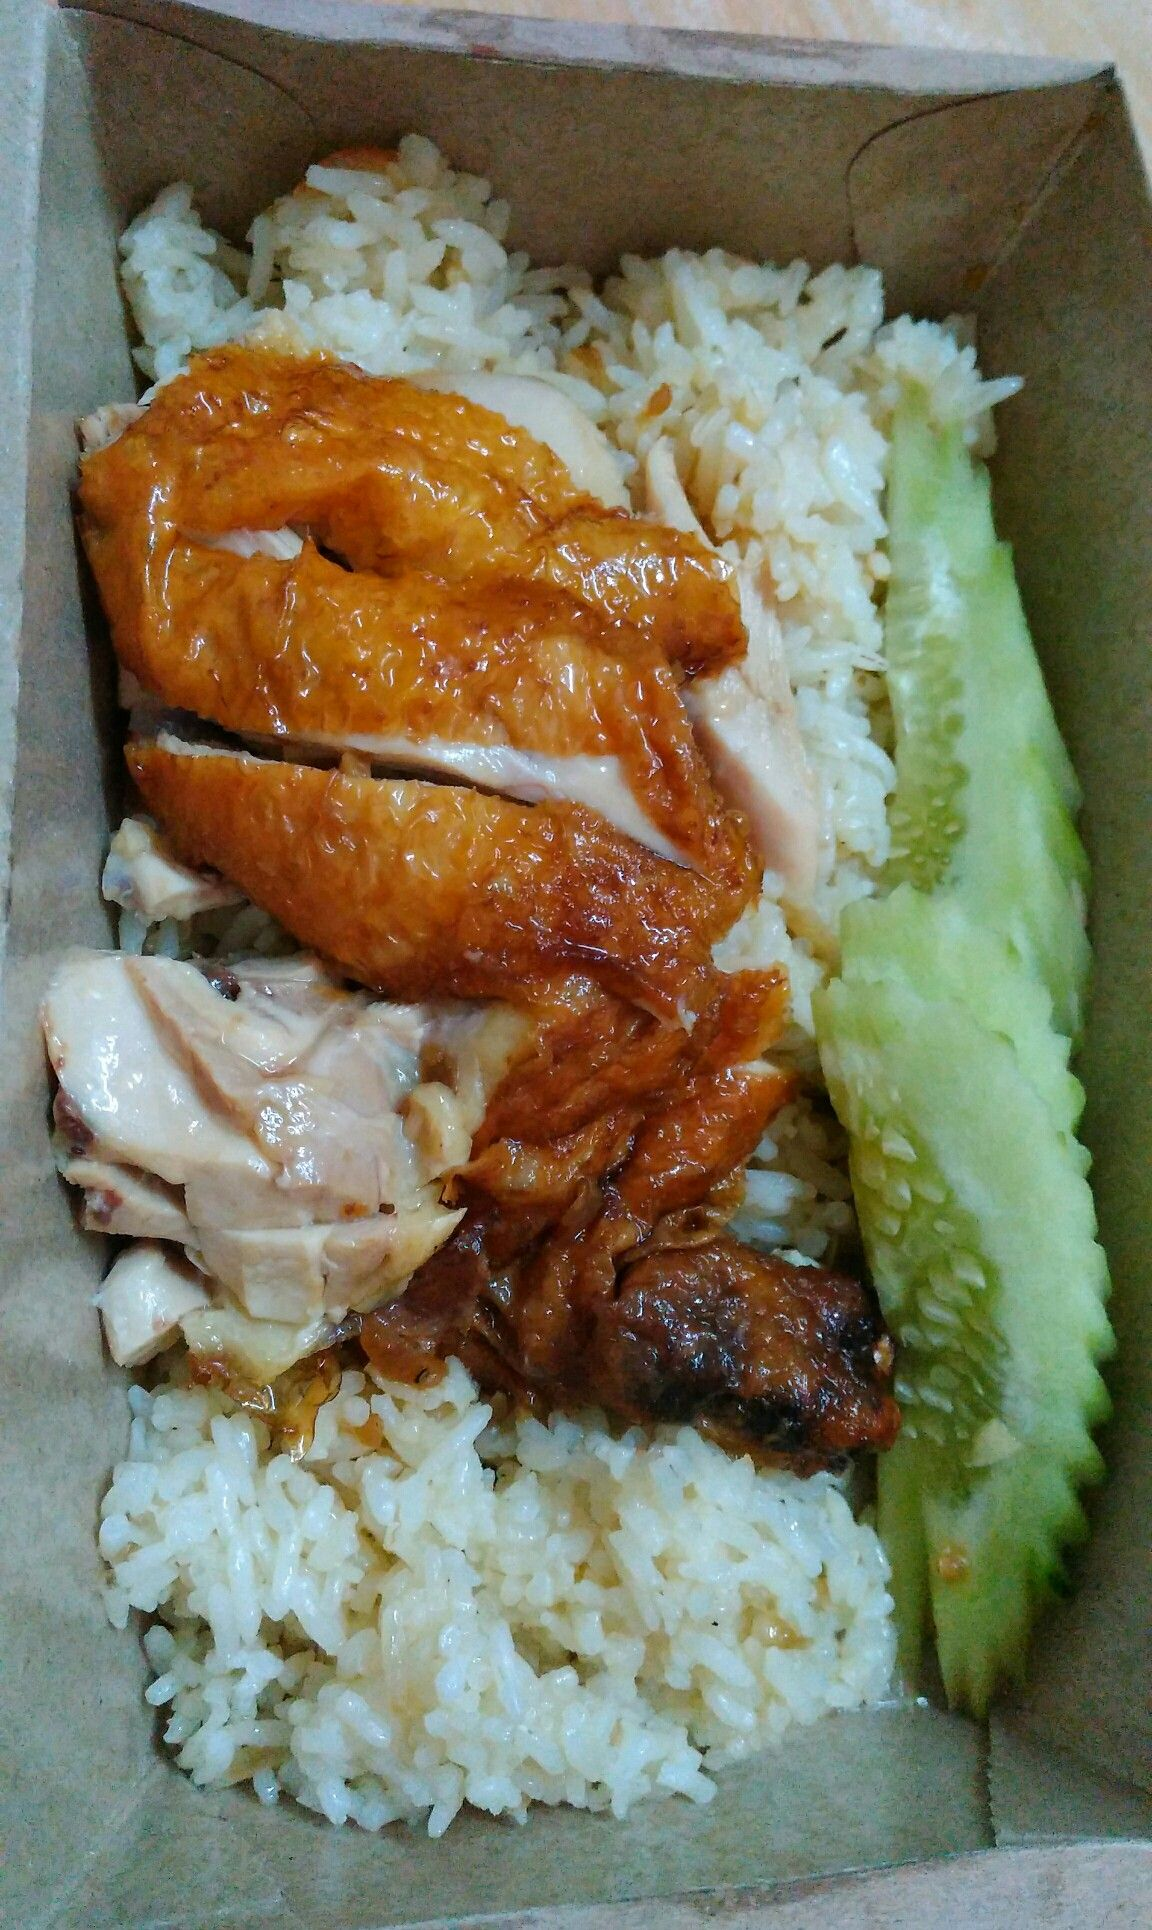 Hainanese Chicken Rice In A Take Away Box Variasi Makanan Resep Makanan Makanan